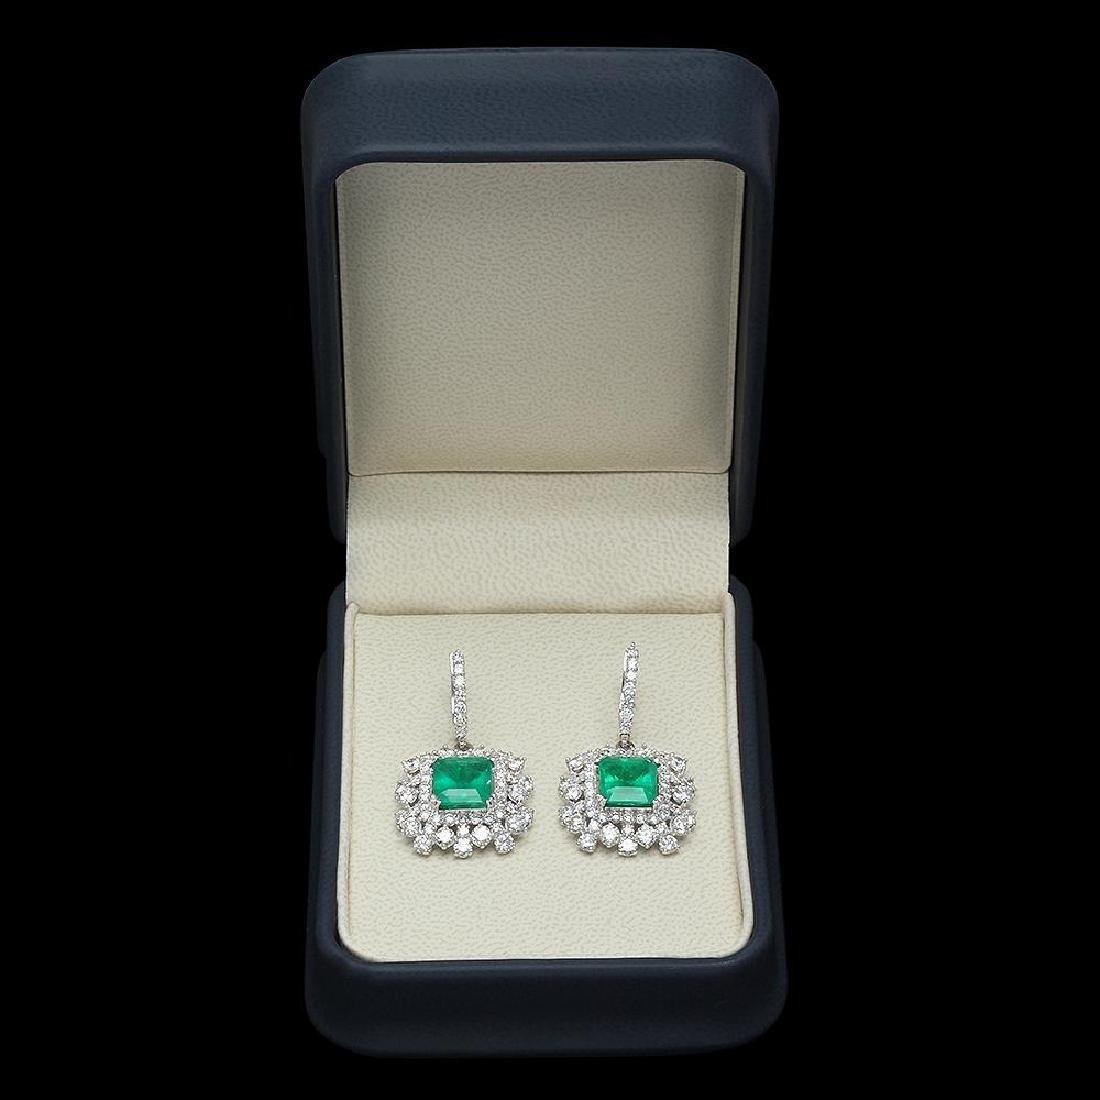 14K Gold 5.68ct Emerald 5.75ct Diamond Earrings - 3